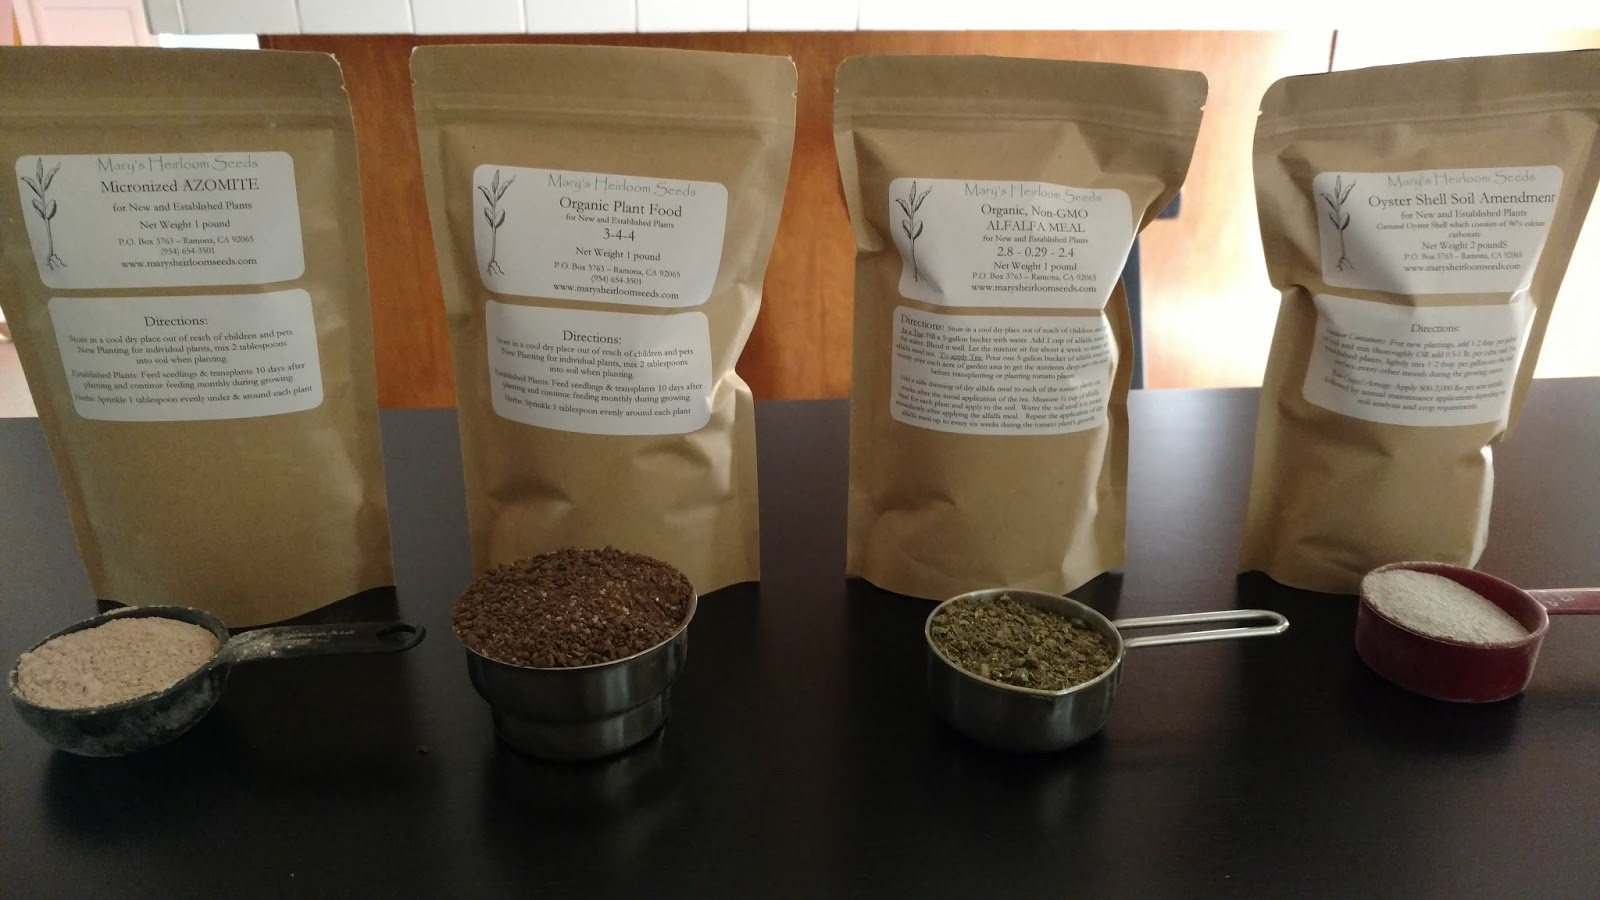 DIY Organic Liquid Fertilizer Mix Posted on 04 Sep 20:43 , 3 comments